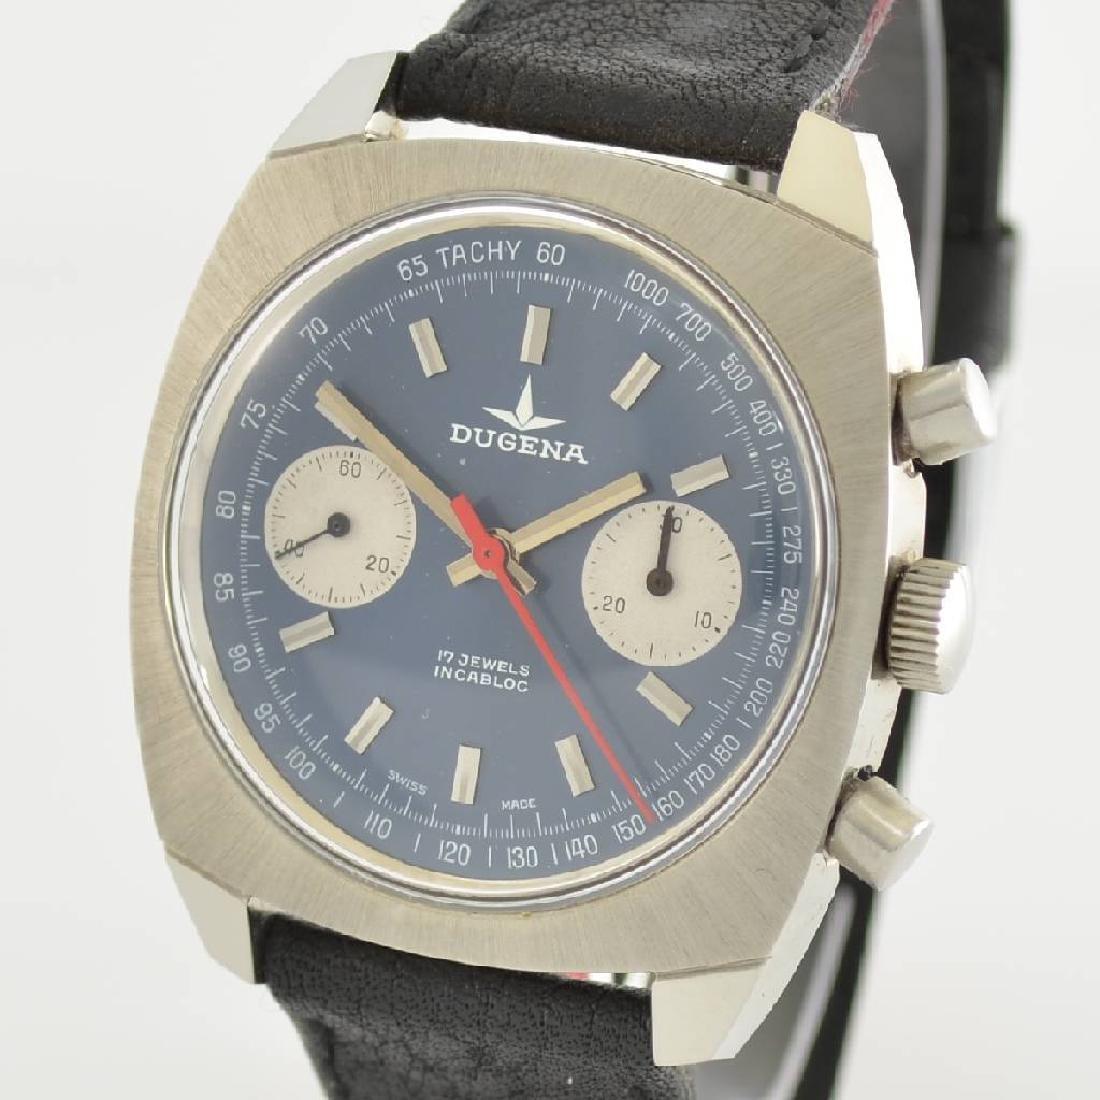 DUGENA unworn gents wristwatch with chronograph - 4